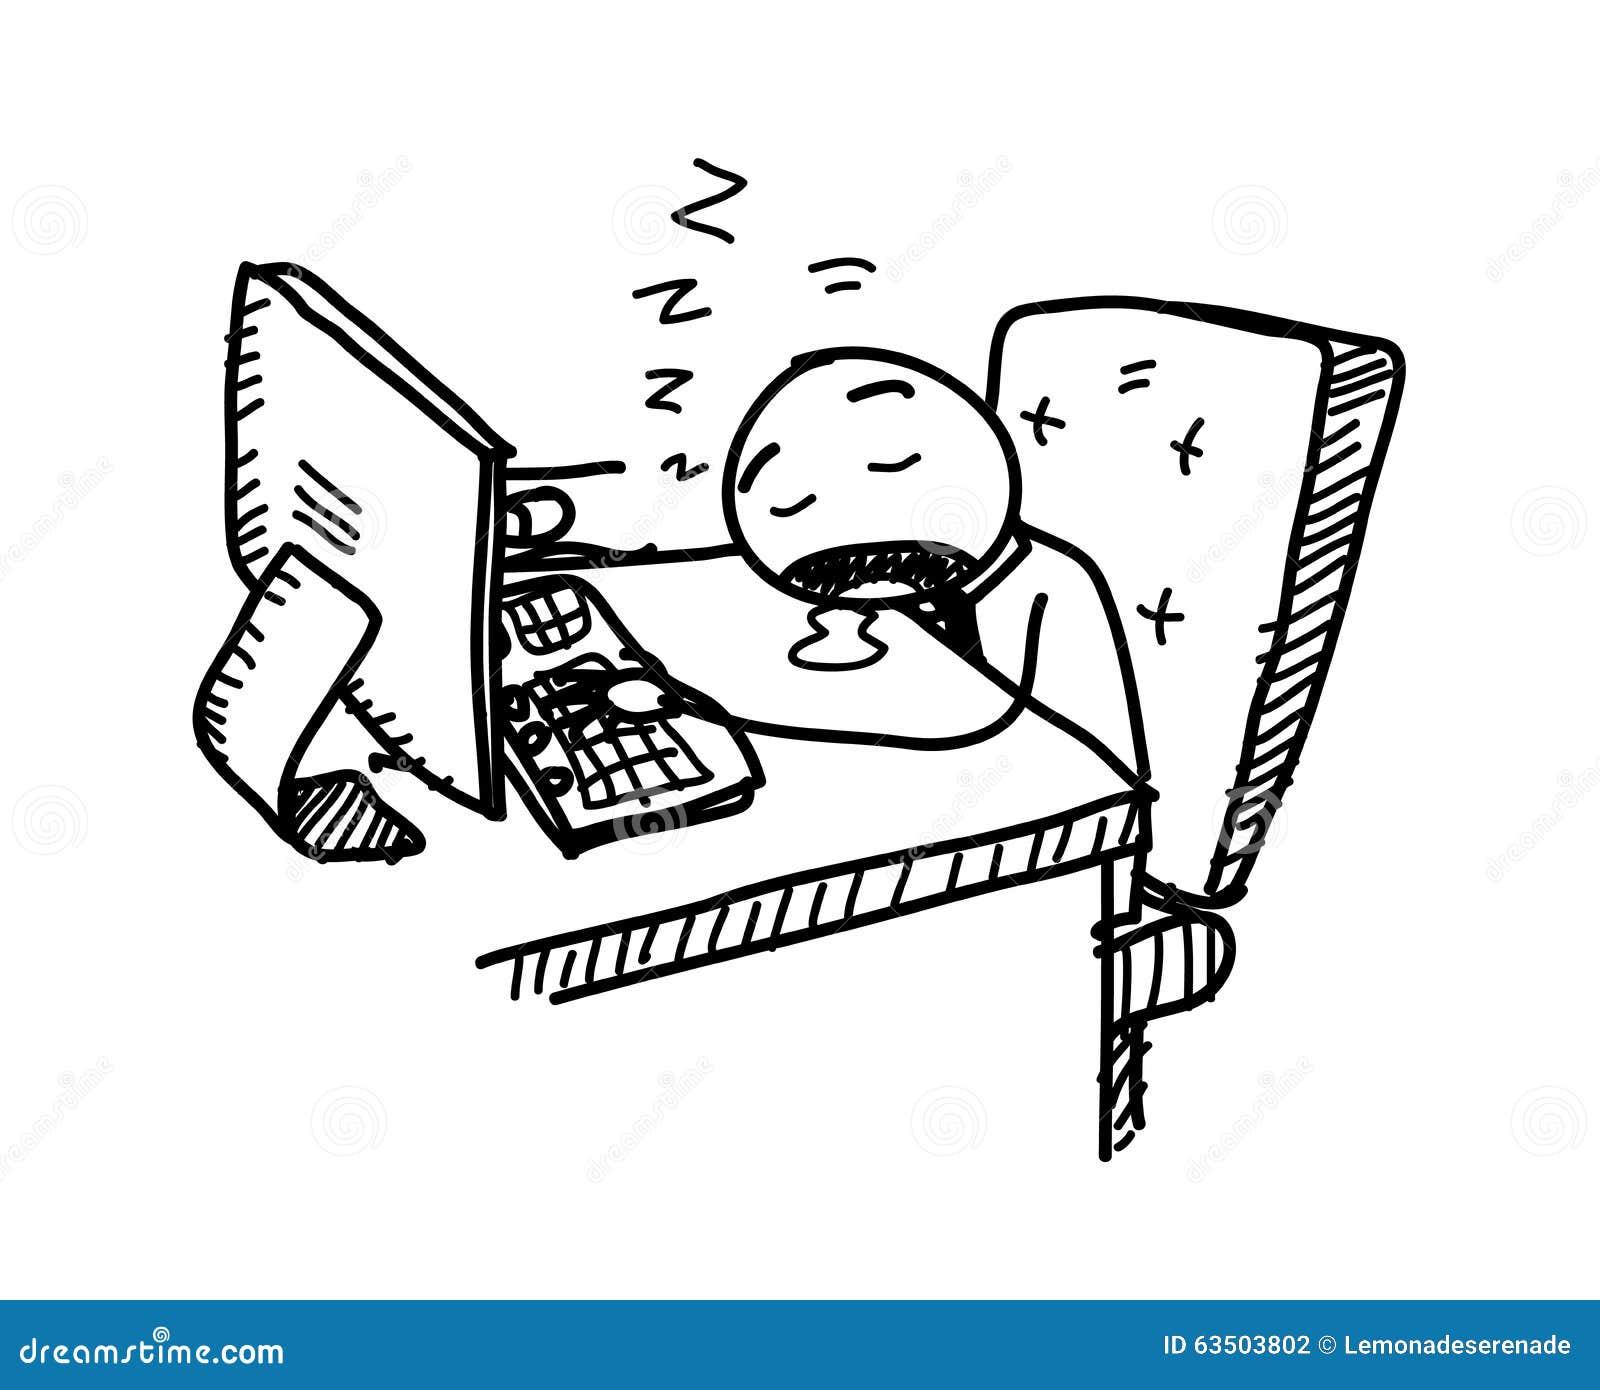 sleeping at work stock vector   image 63503802